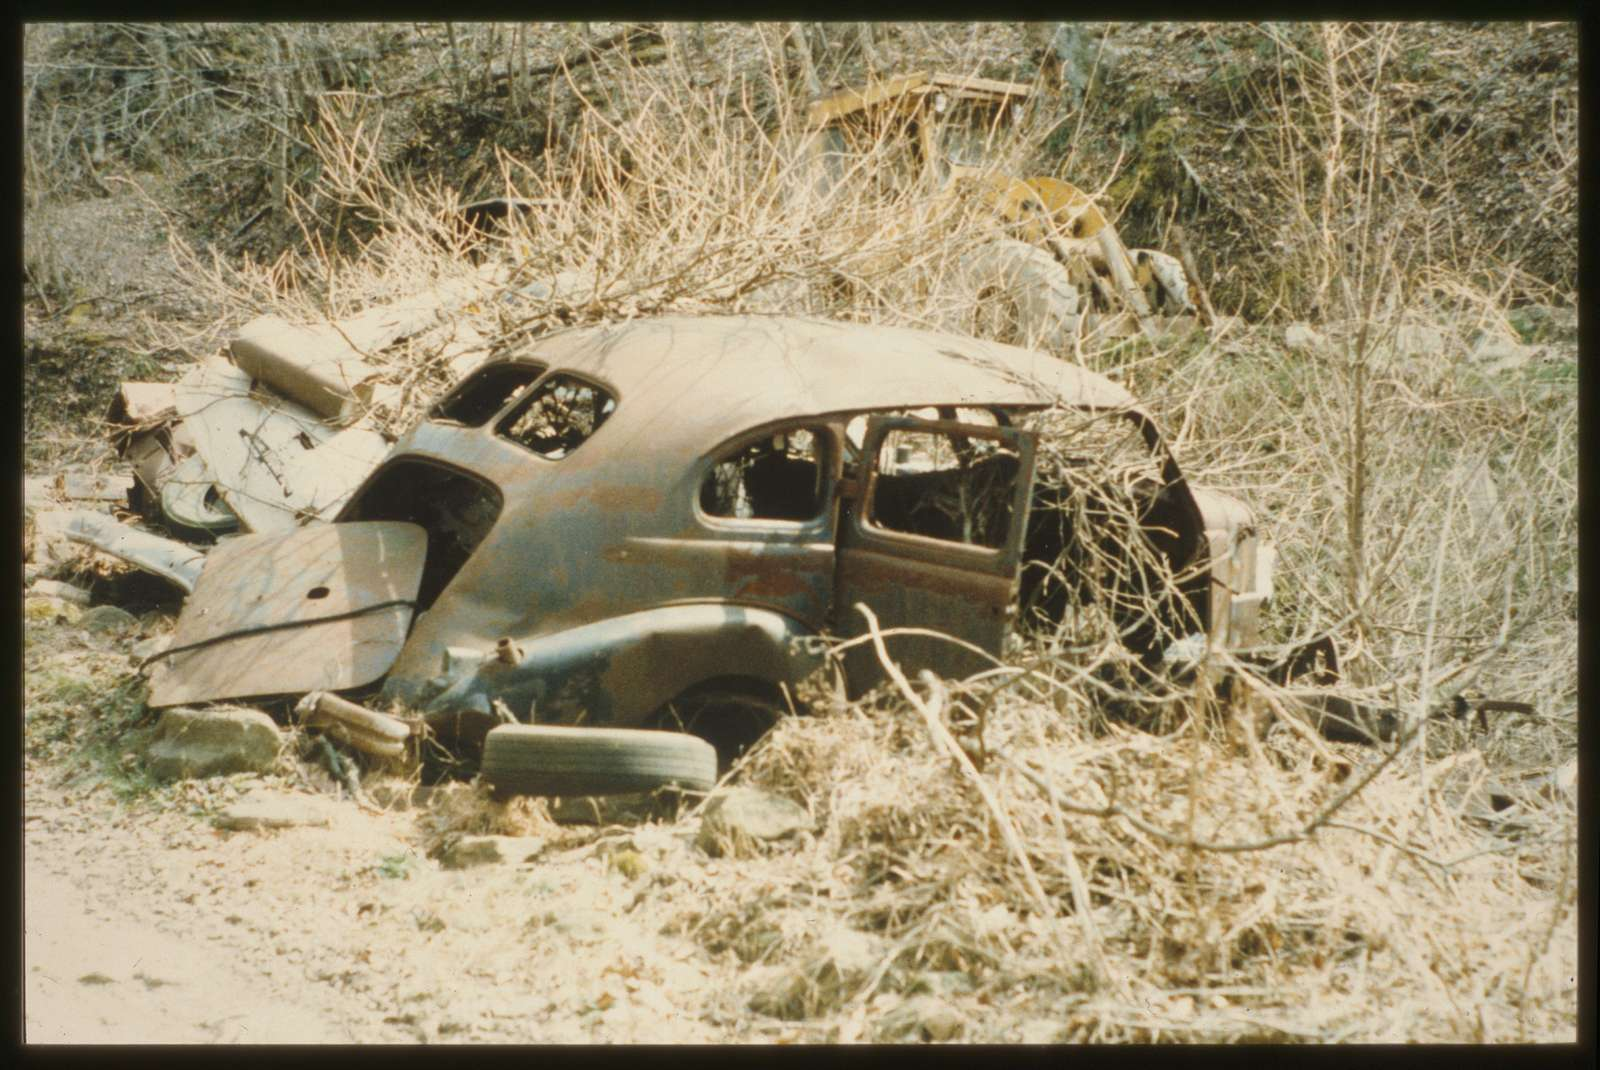 Leewin Richmond's '37 Buick, on Shumate's Branch